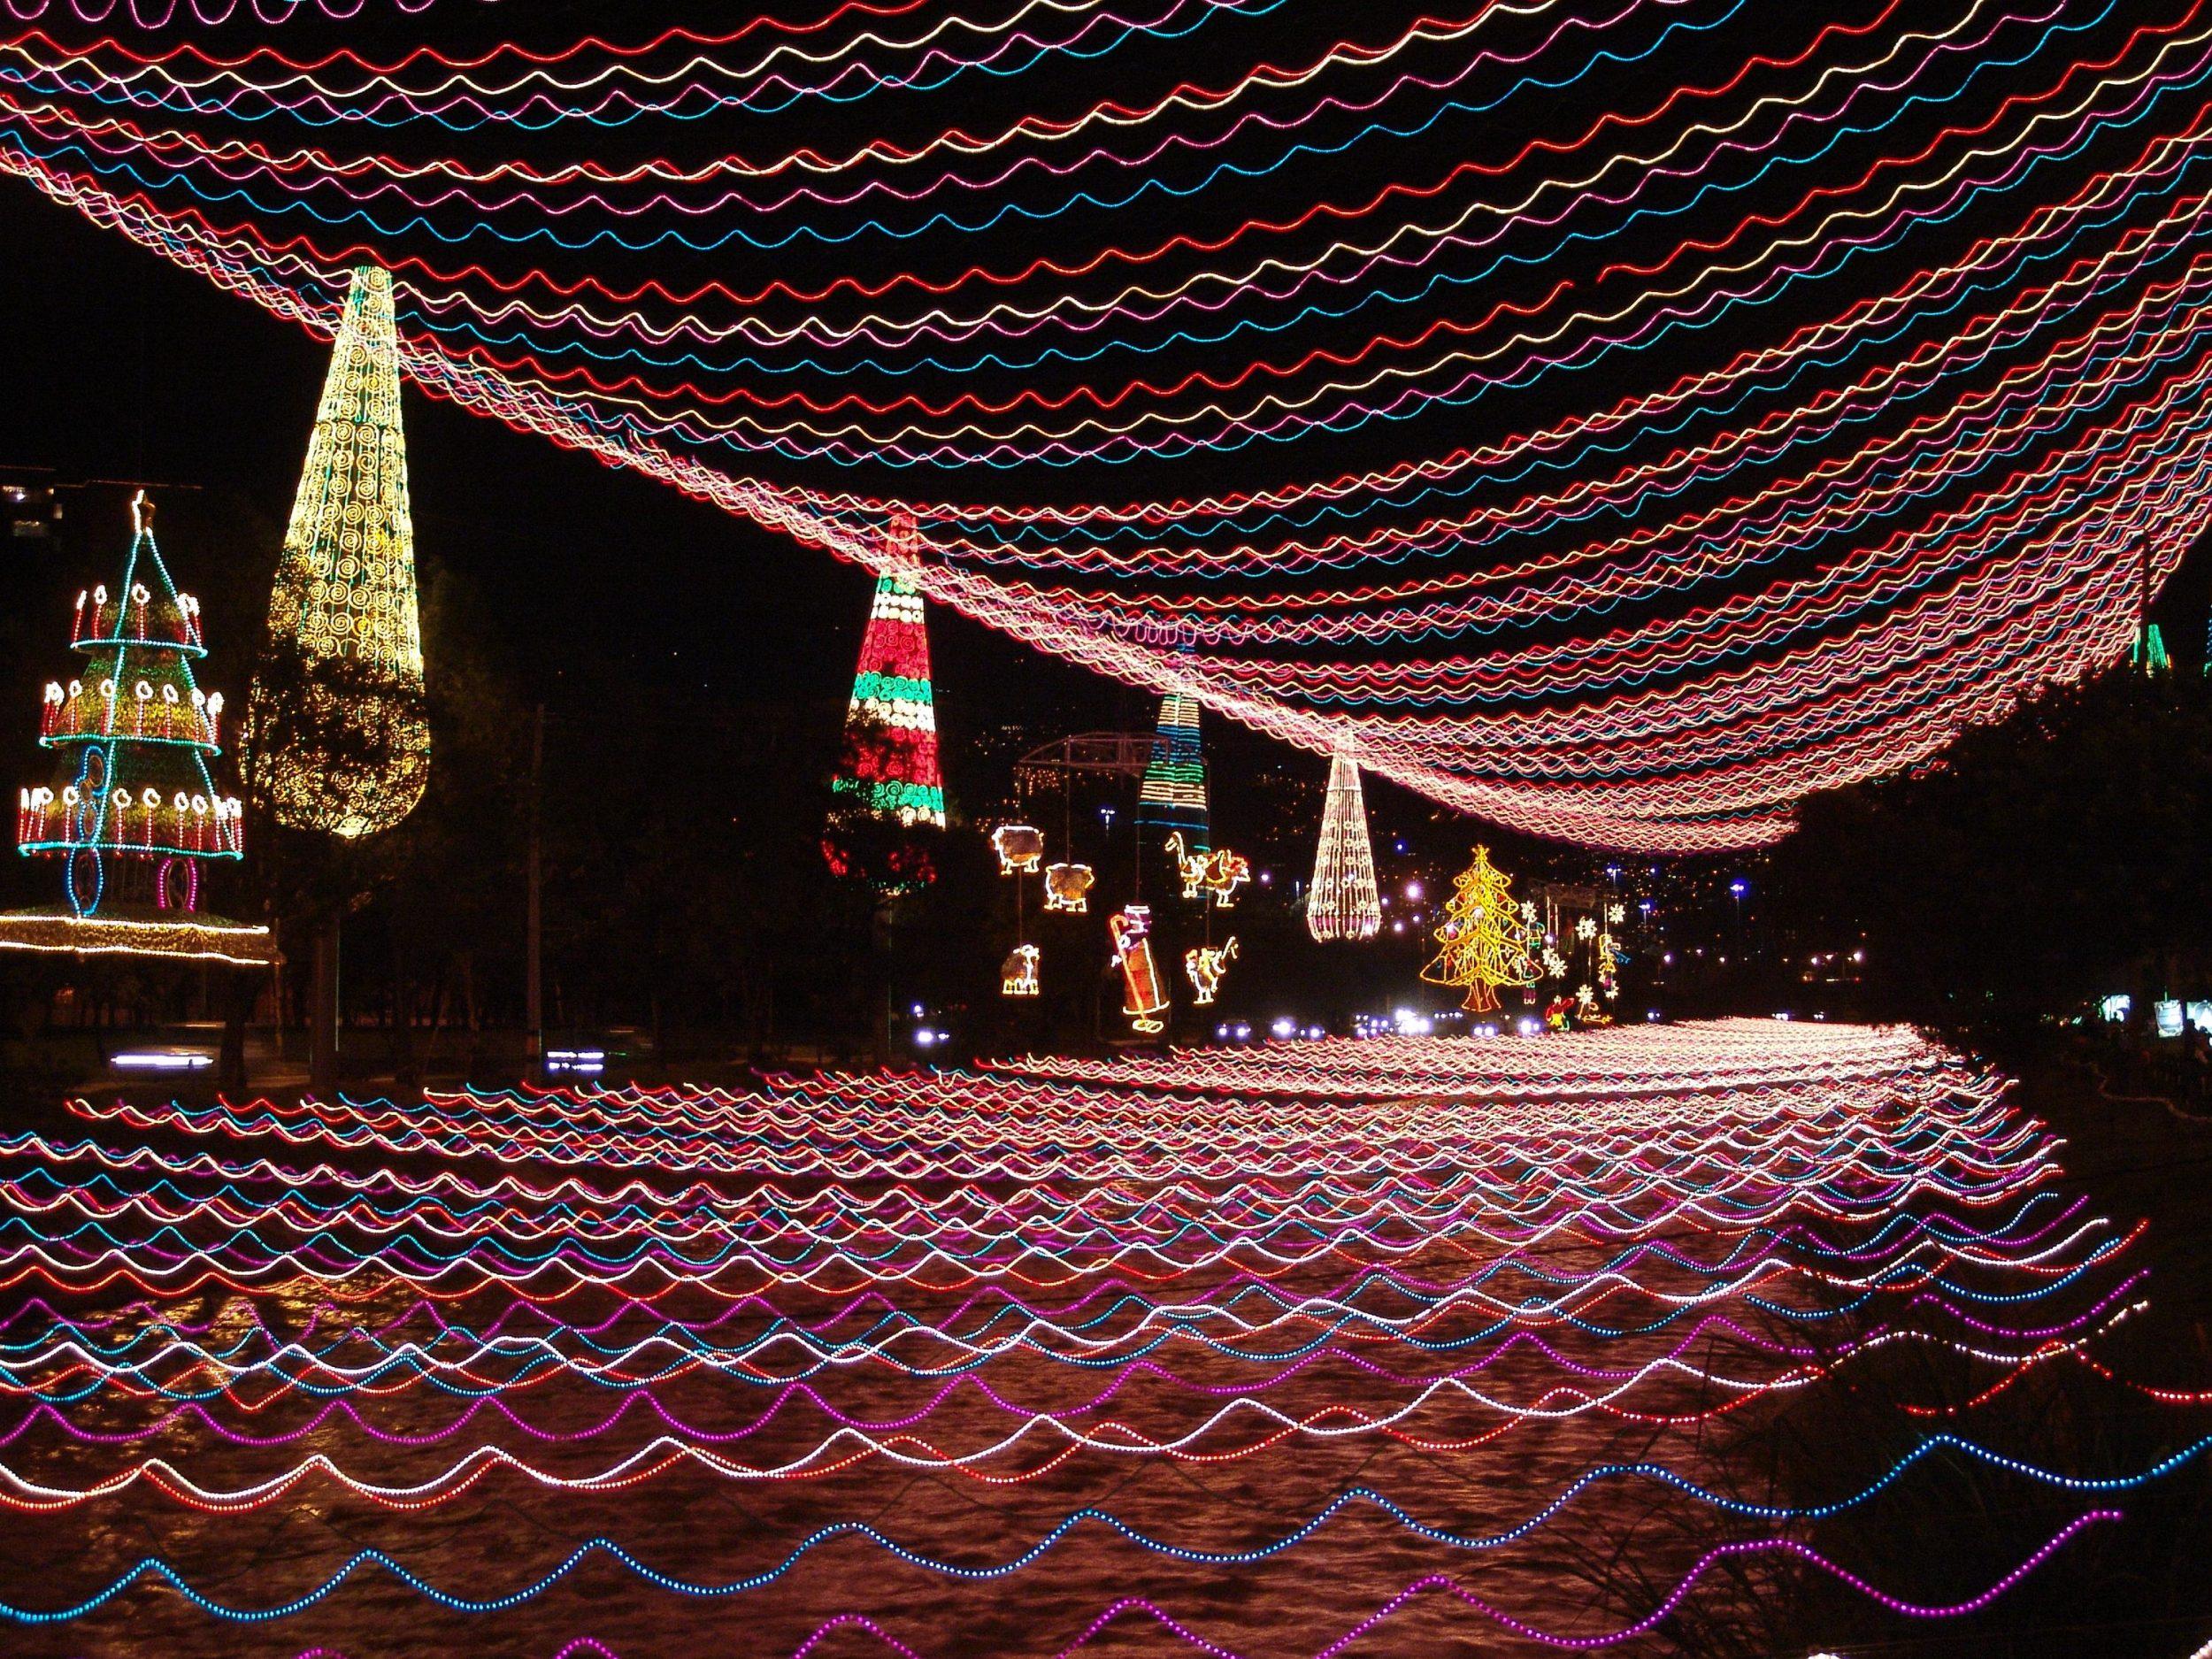 Christmas lights in Medellín over the river